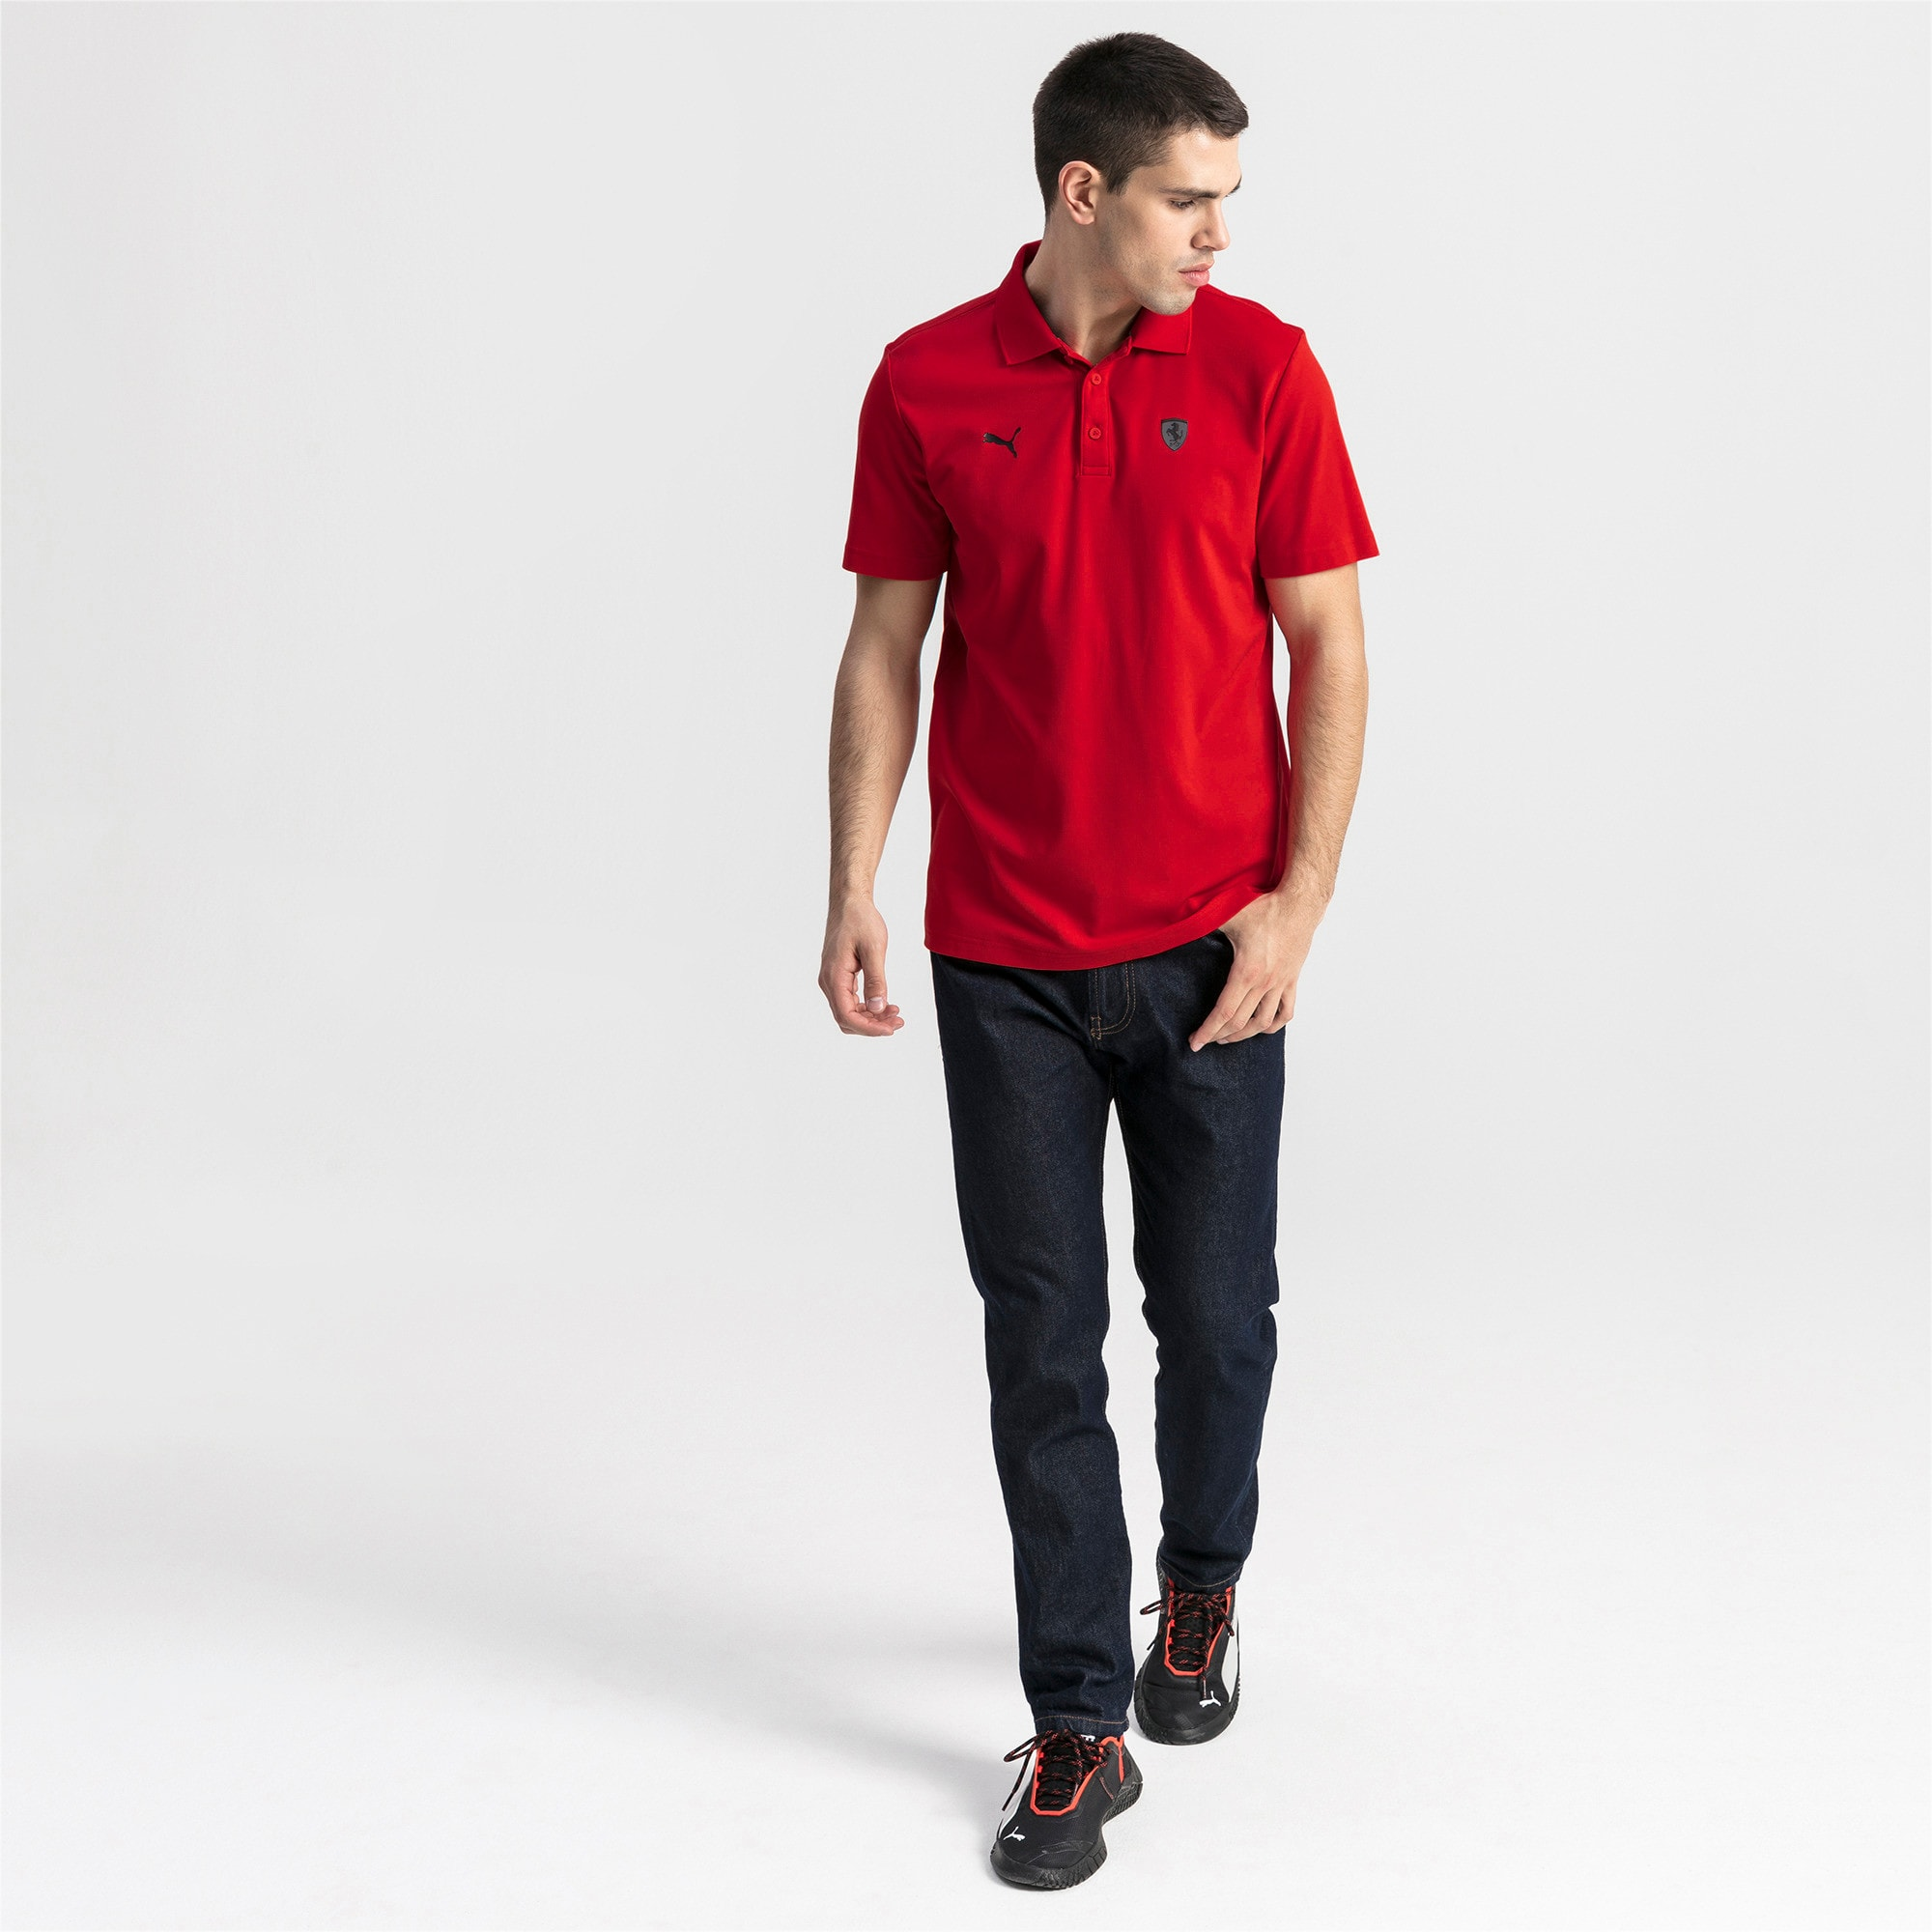 Thumbnail 3 of Ferrari Men's Polo Shirt, Rosso Corsa, medium